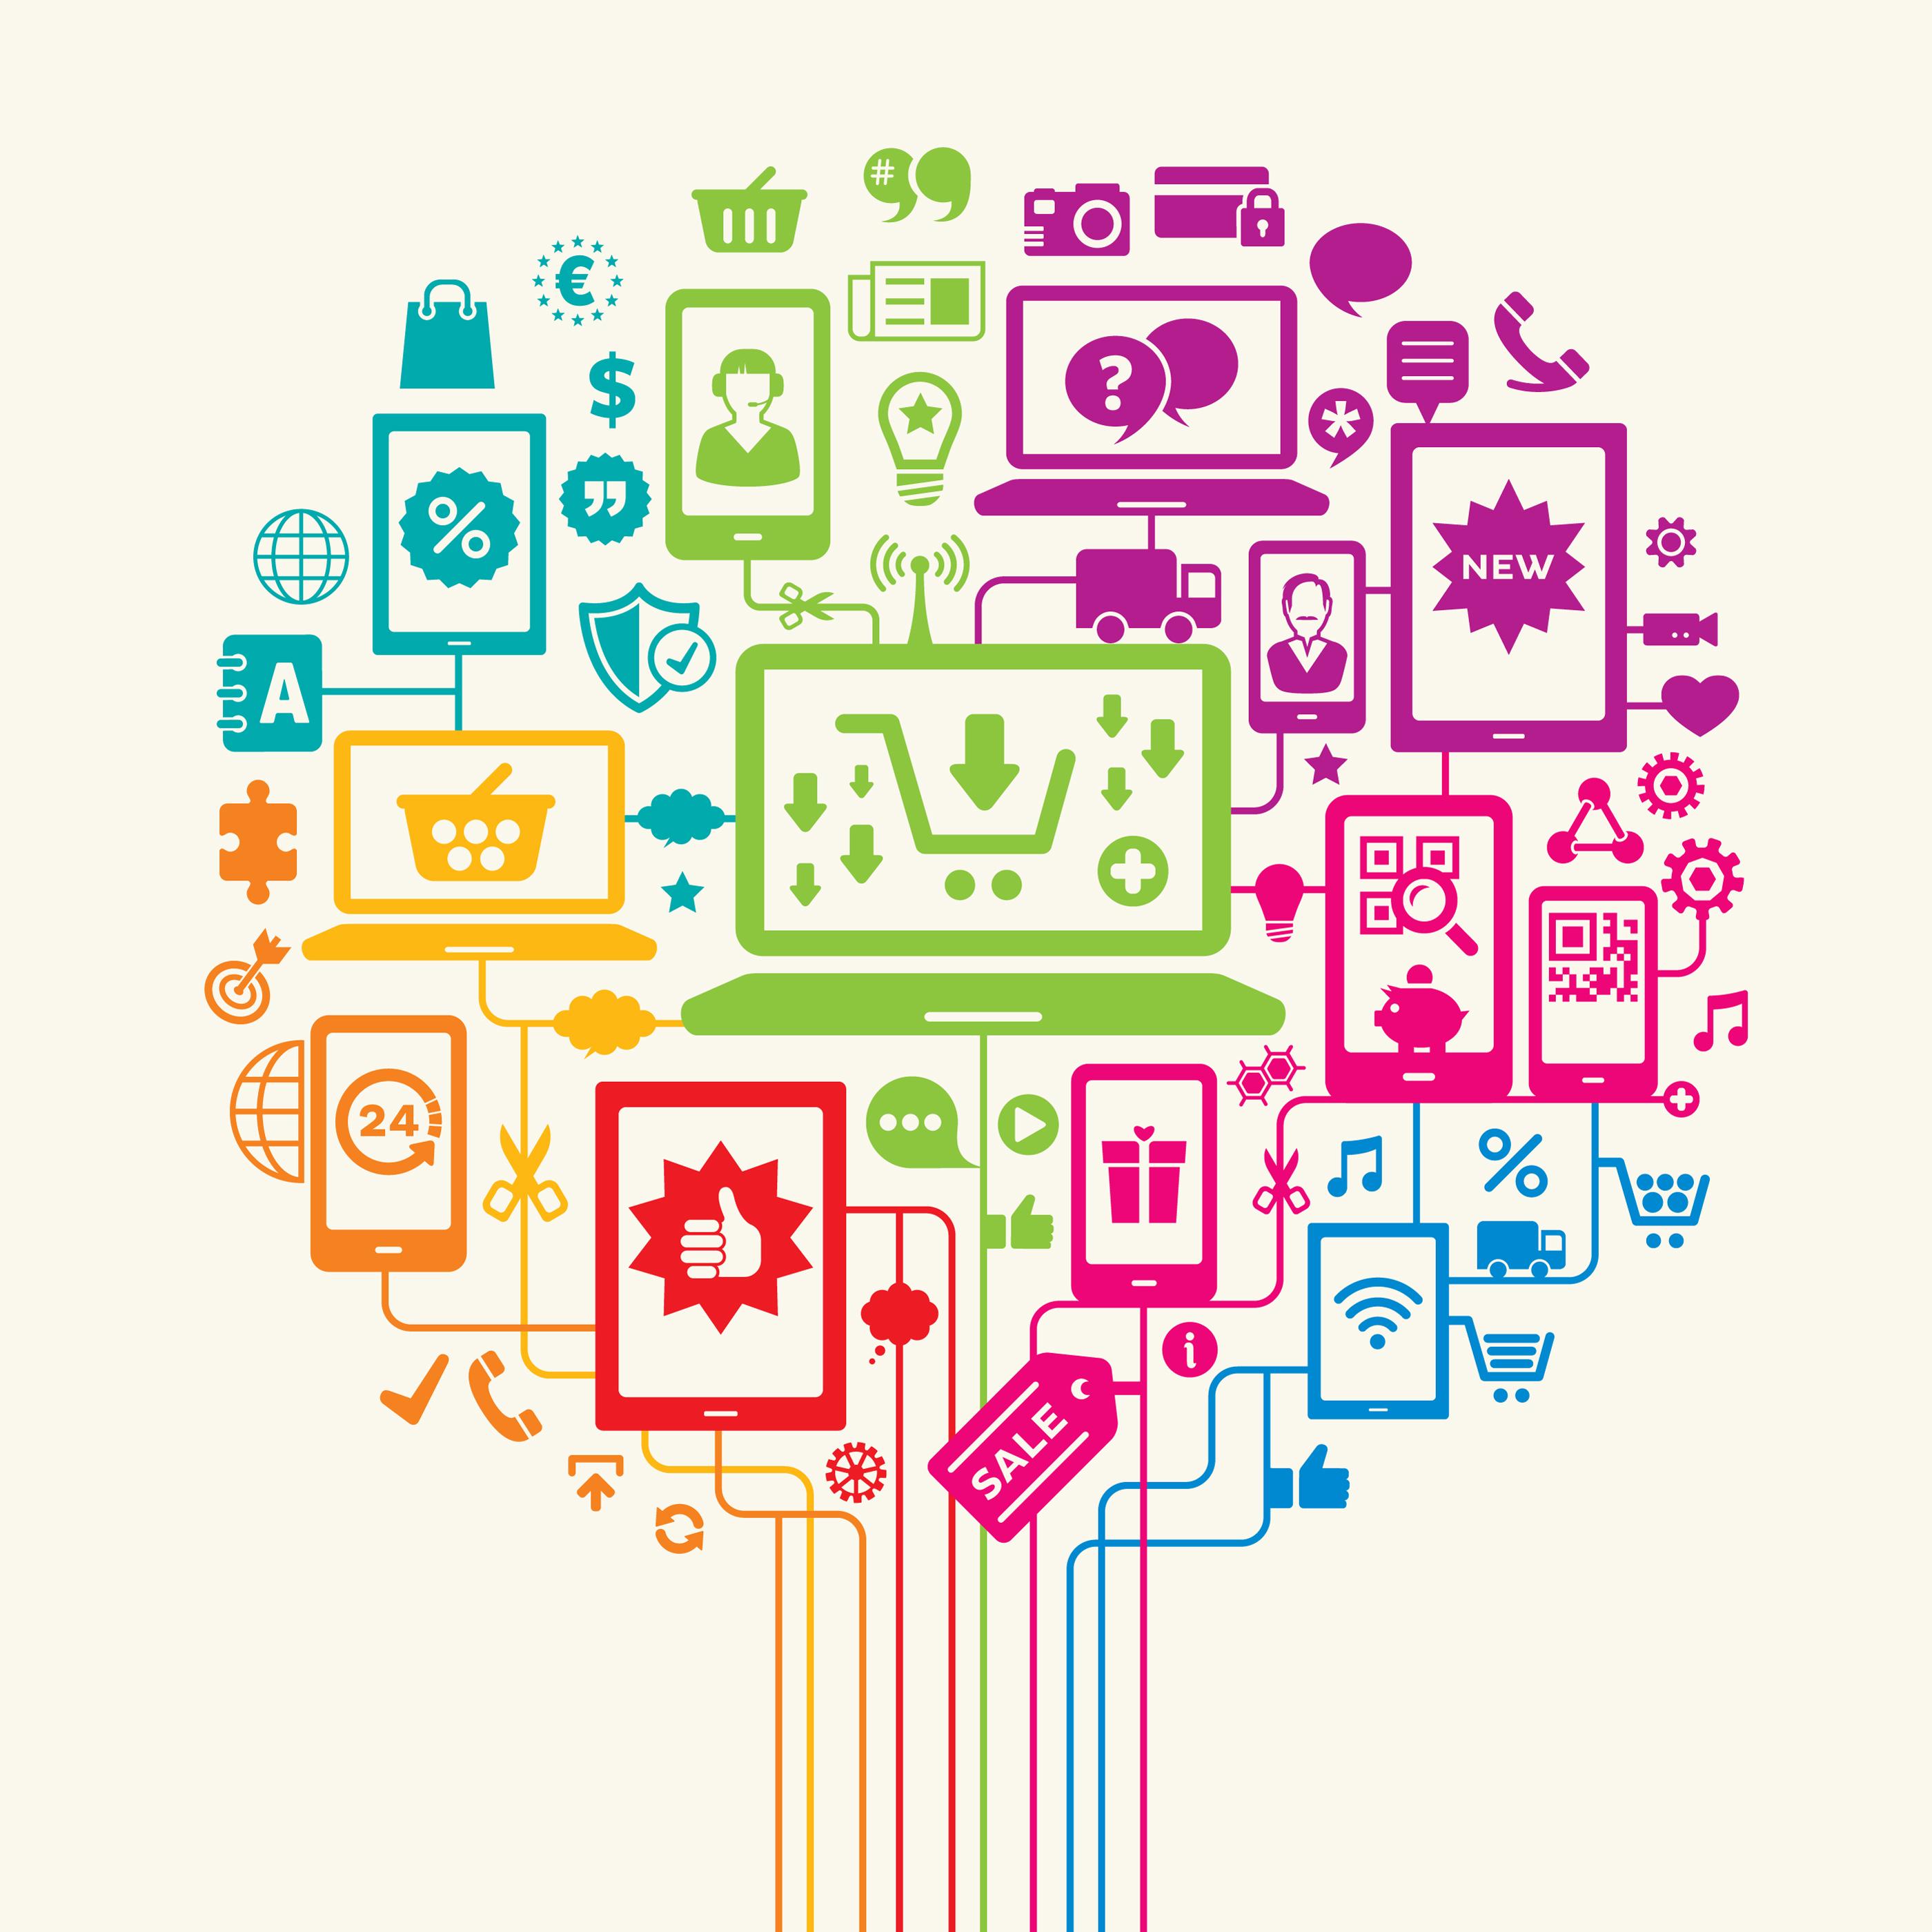 Через 5 лет 40% онлайн-рынка займут маркетплейсы